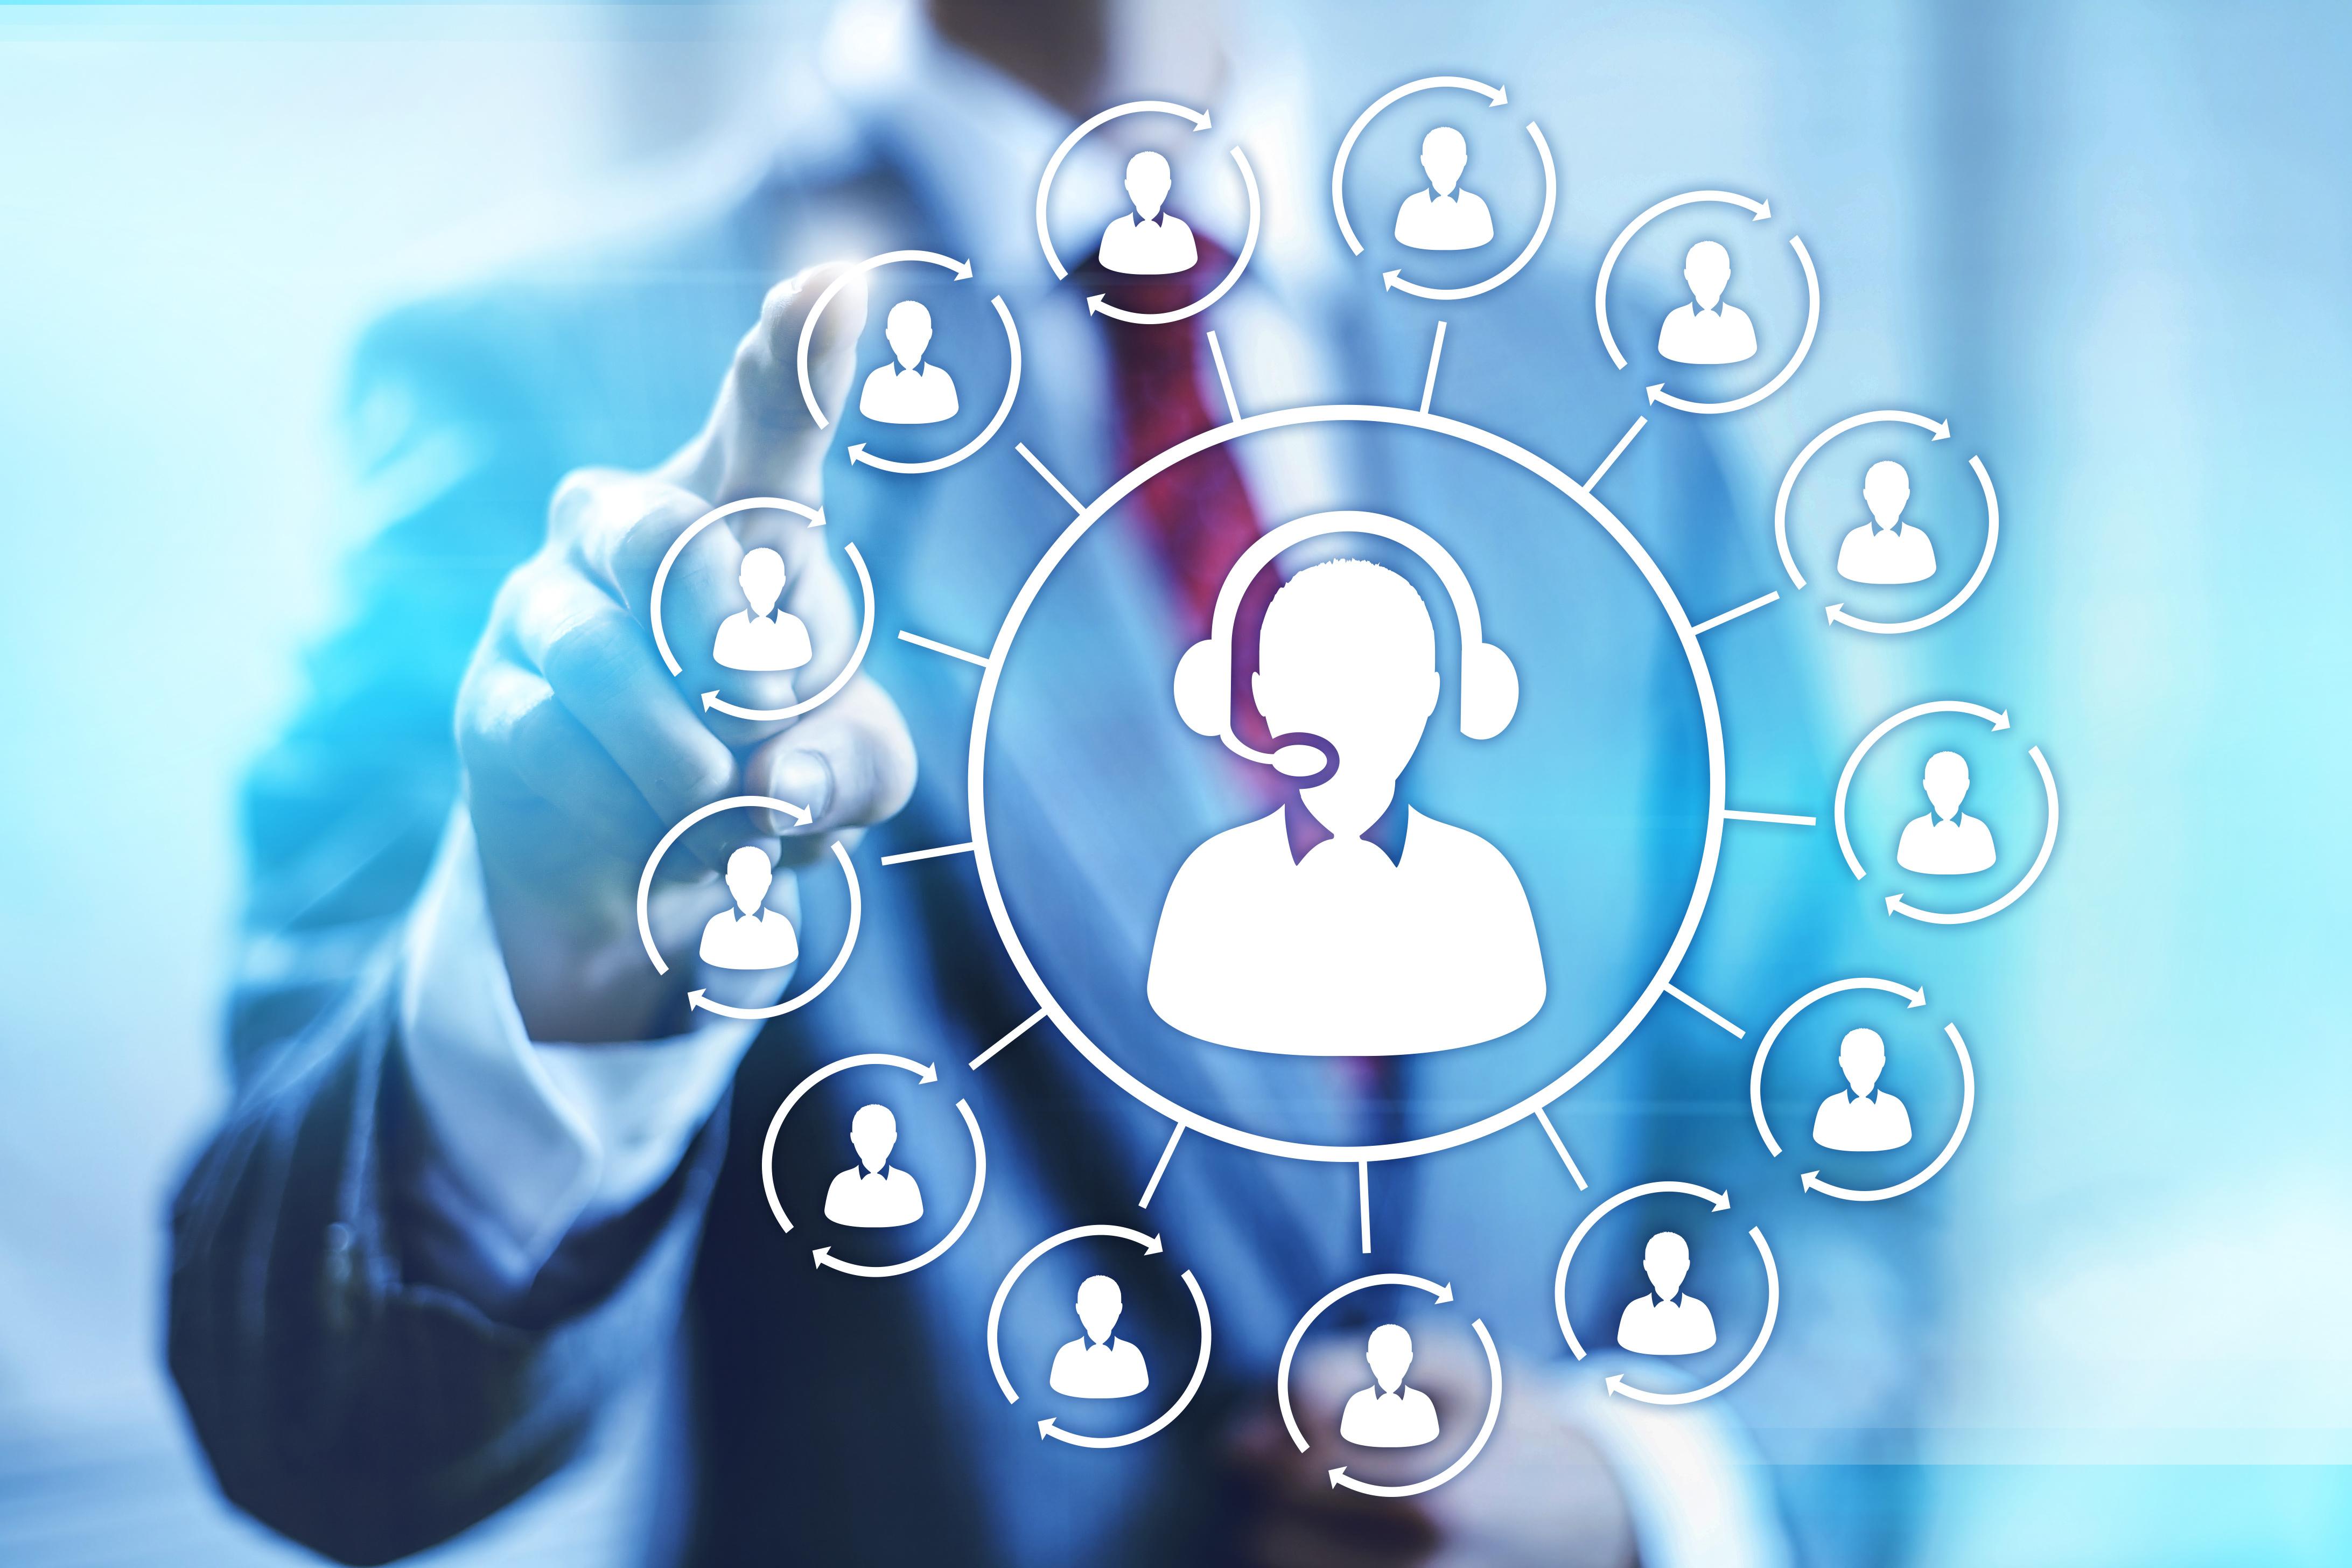 004 benefits telemarketing